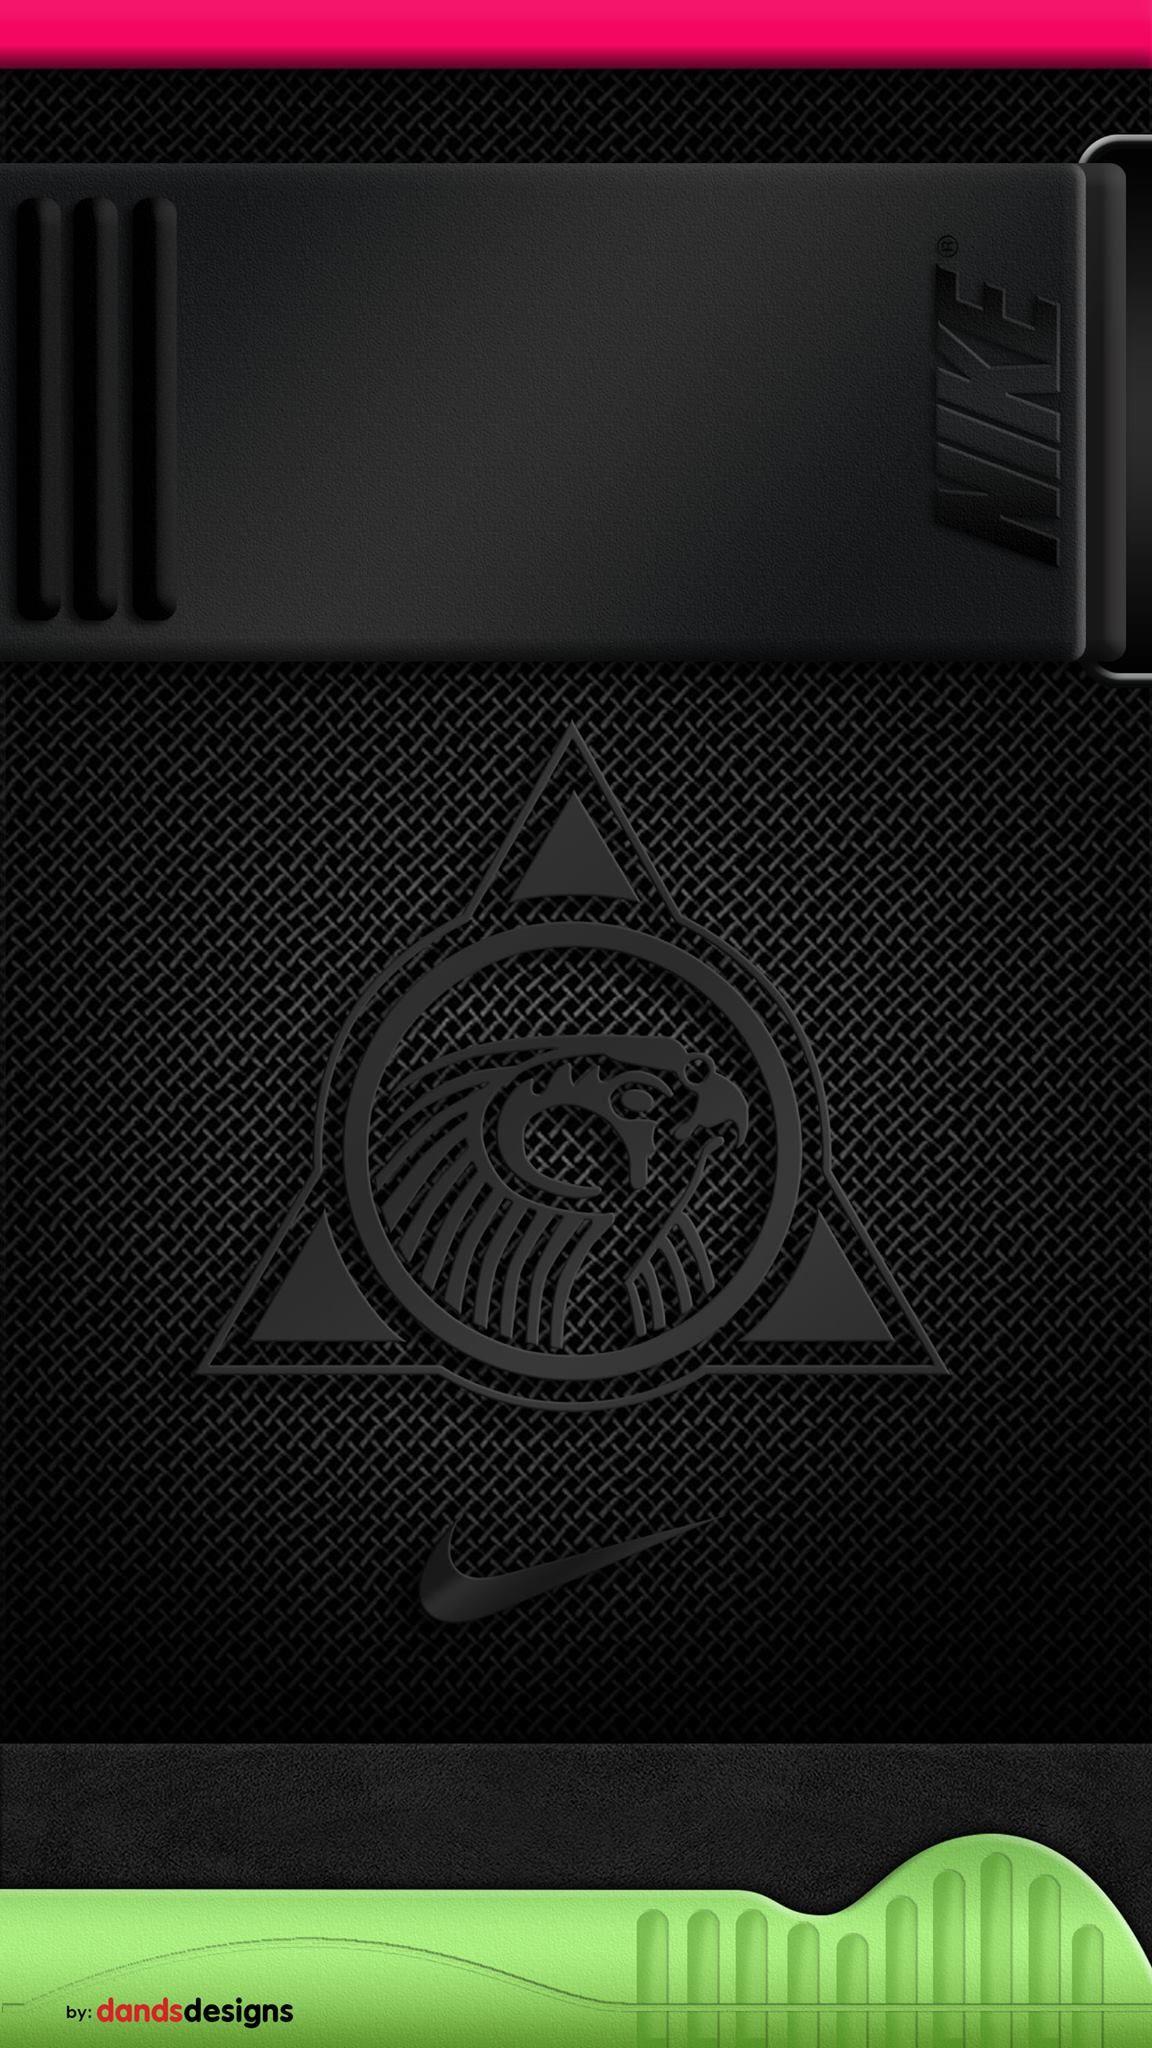 10856459 825600274143380 1214326516316722051 O Jpg 1 152 2 048 Pixels Sneakers Wallpaper Hype Wallpaper Iphone 6 Plus Wallpaper